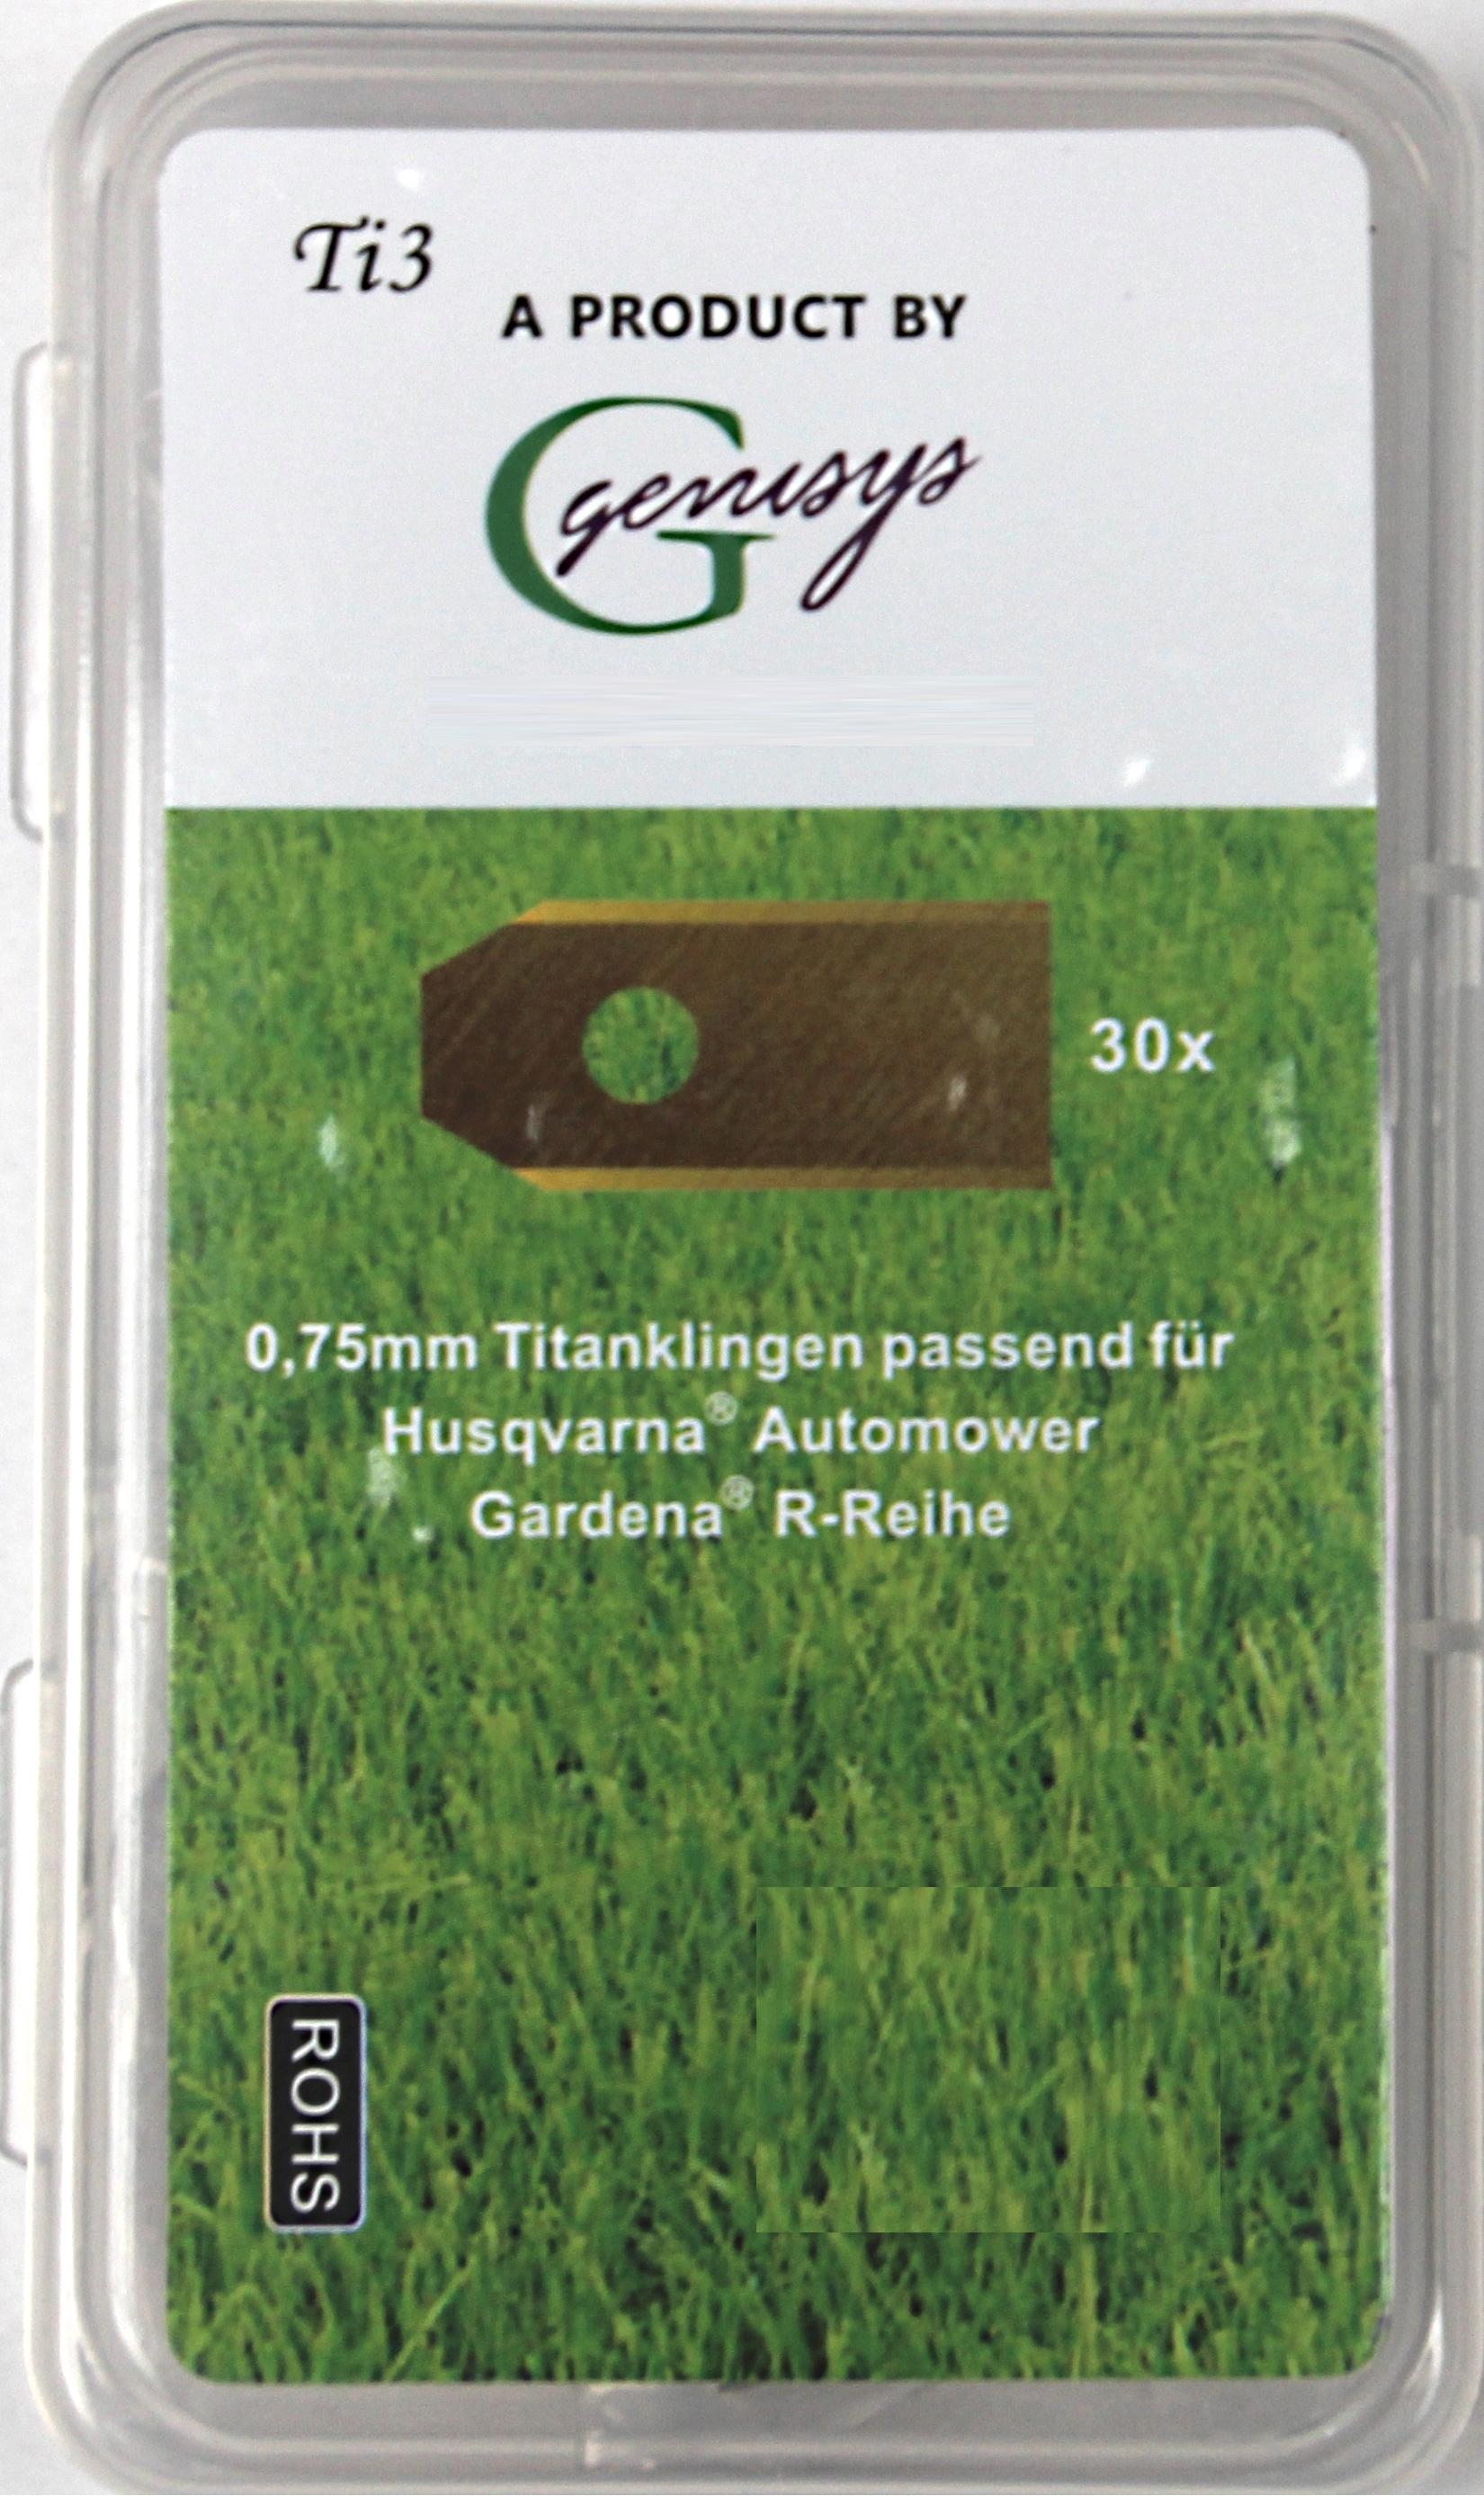 60 Messer Klingen LongLife Ersatzmesser f Husqvarna Automower Gardena Mähroboter